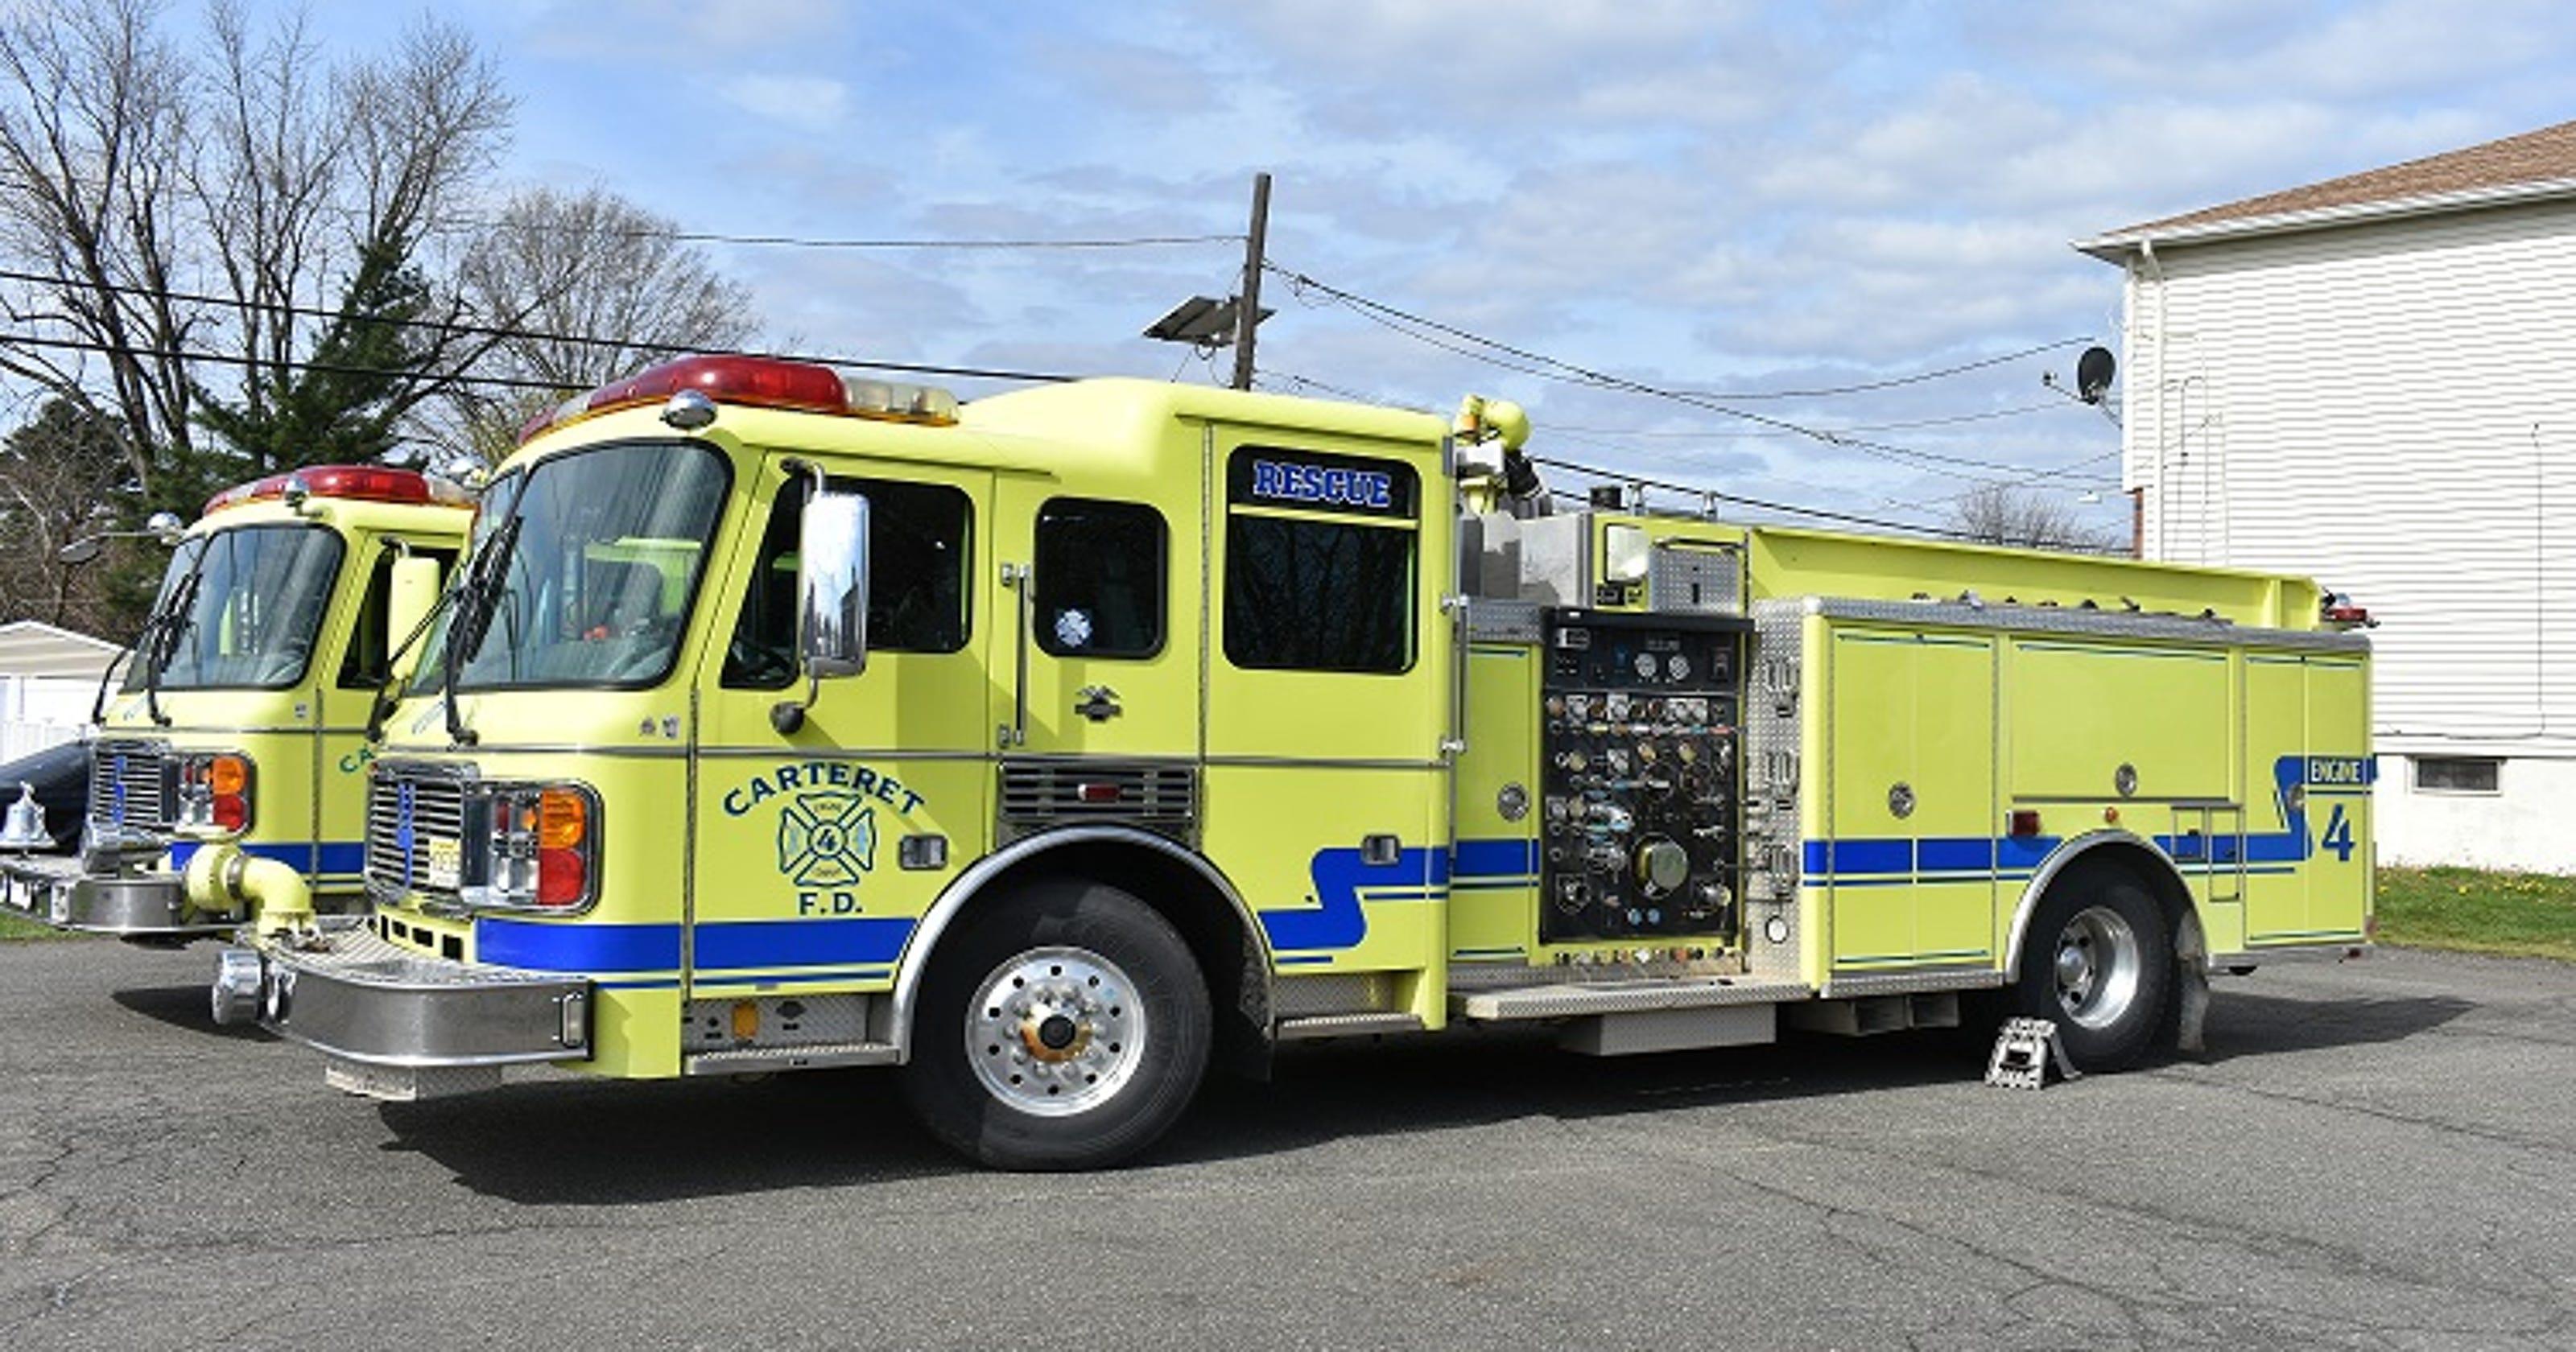 Carteret Fire Trucks Headed To Help Puerto Rico Hurricane Victims